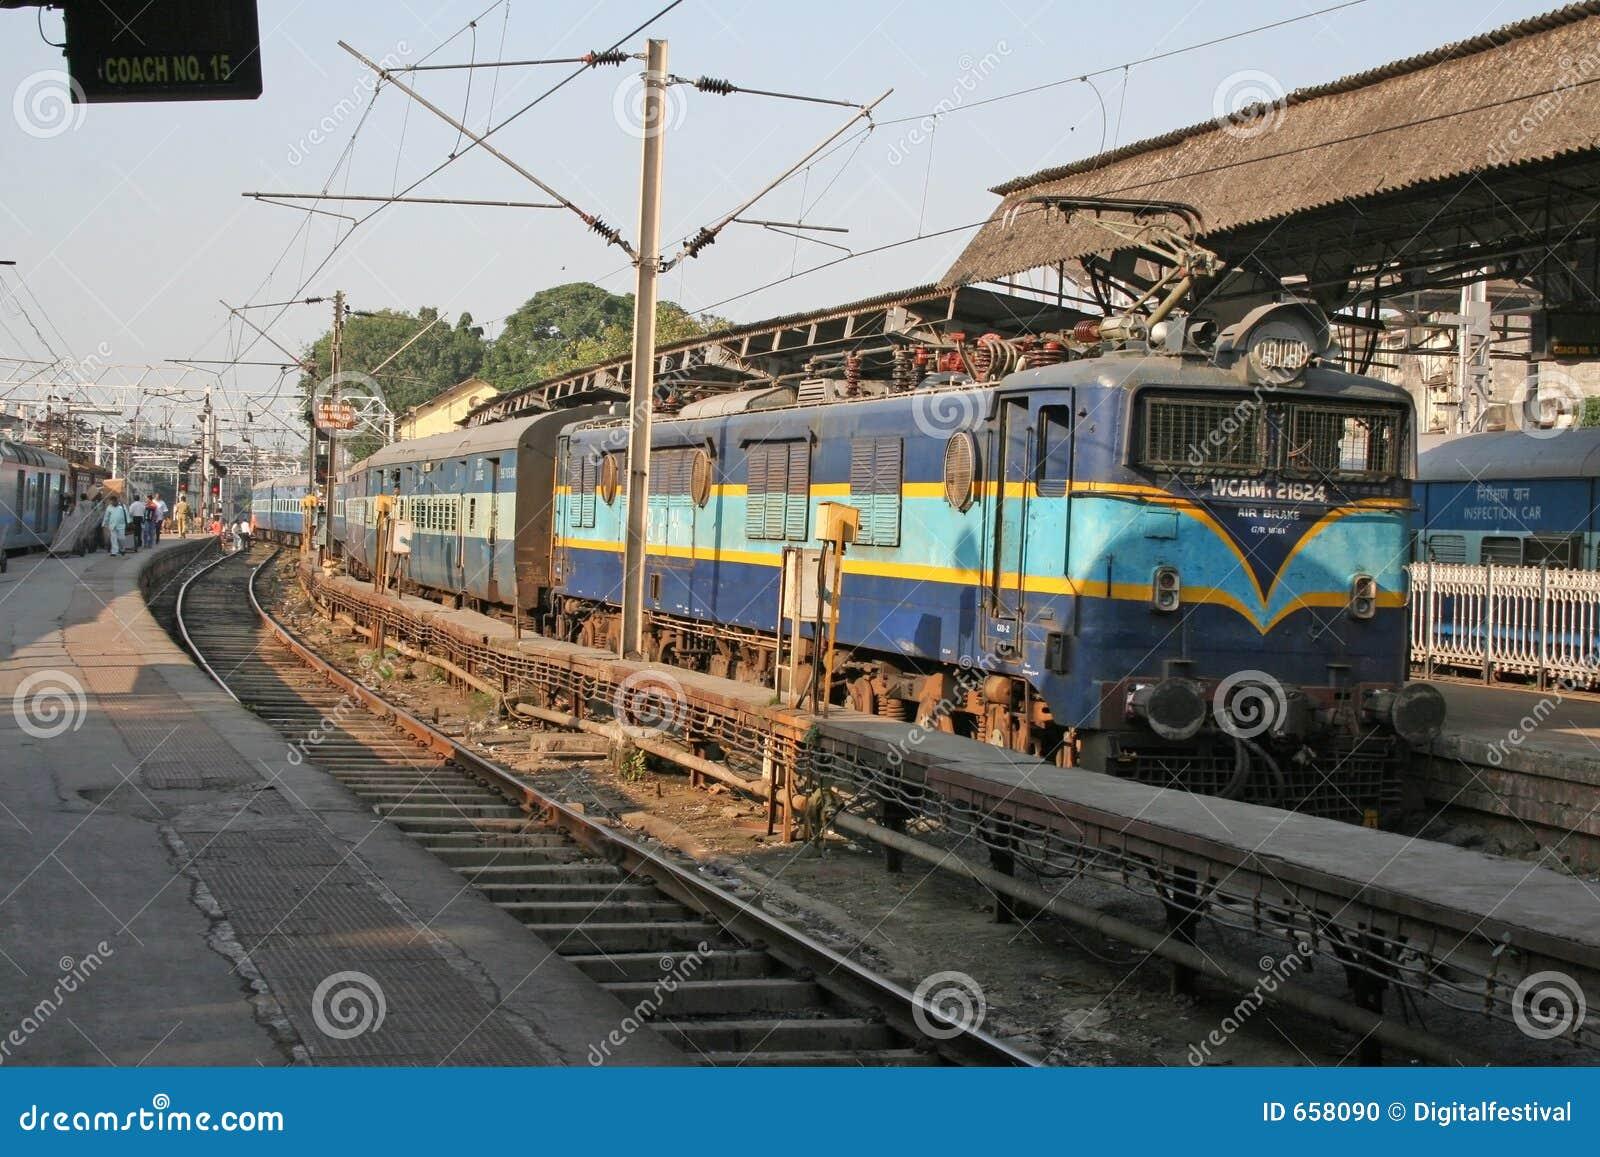 Electric Locomotive Engine And Railroad Train Stock Photo